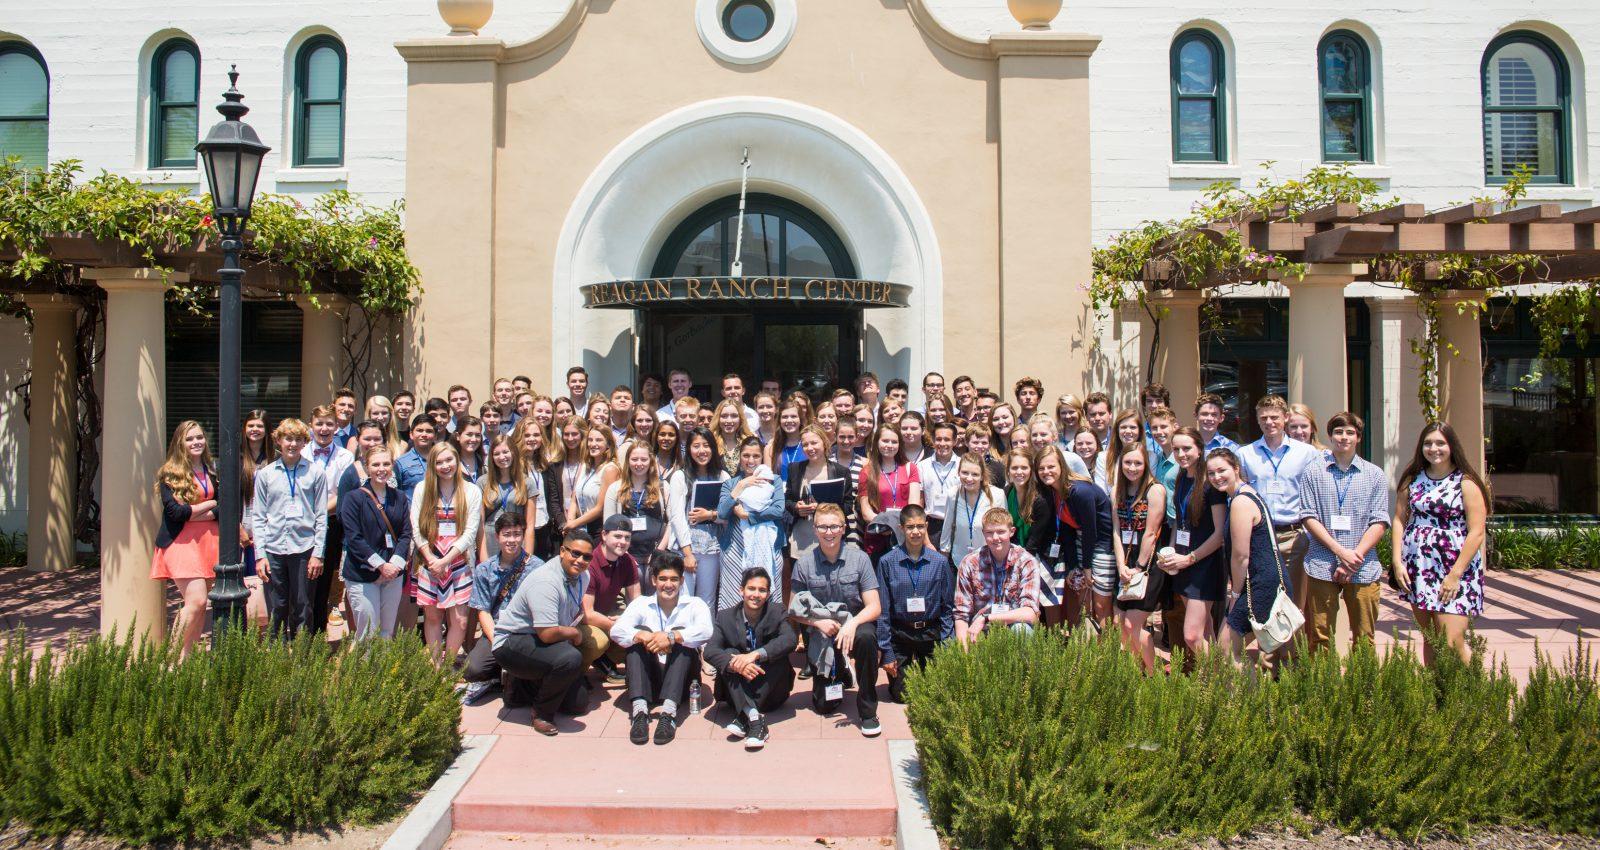 <b>High School Conference at the Reagan Ranch</b>